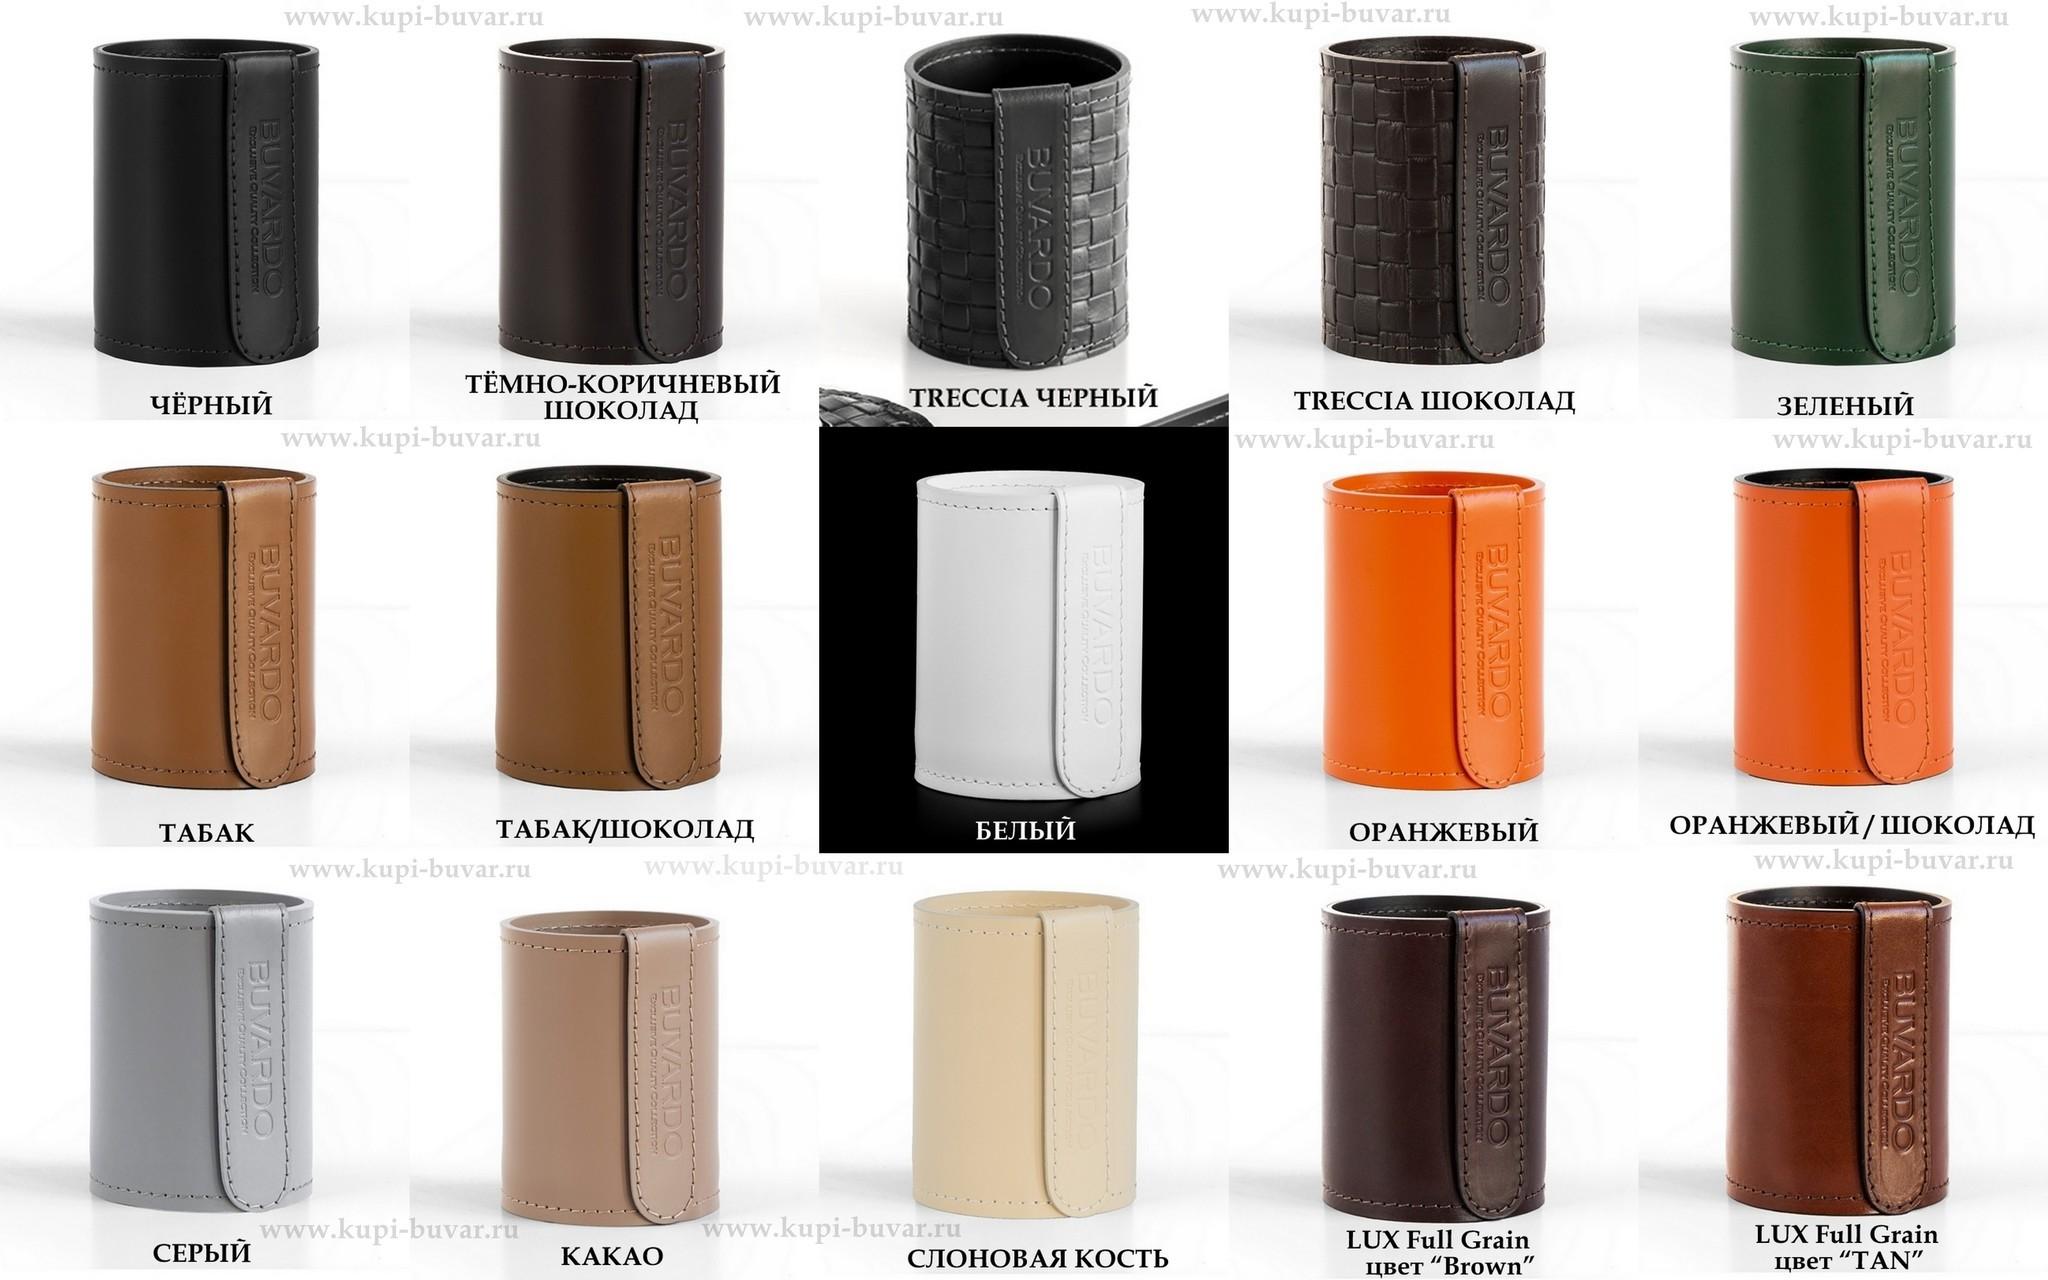 Варианты цвета кожи Cuoietto для набора 1562-СТ-13.